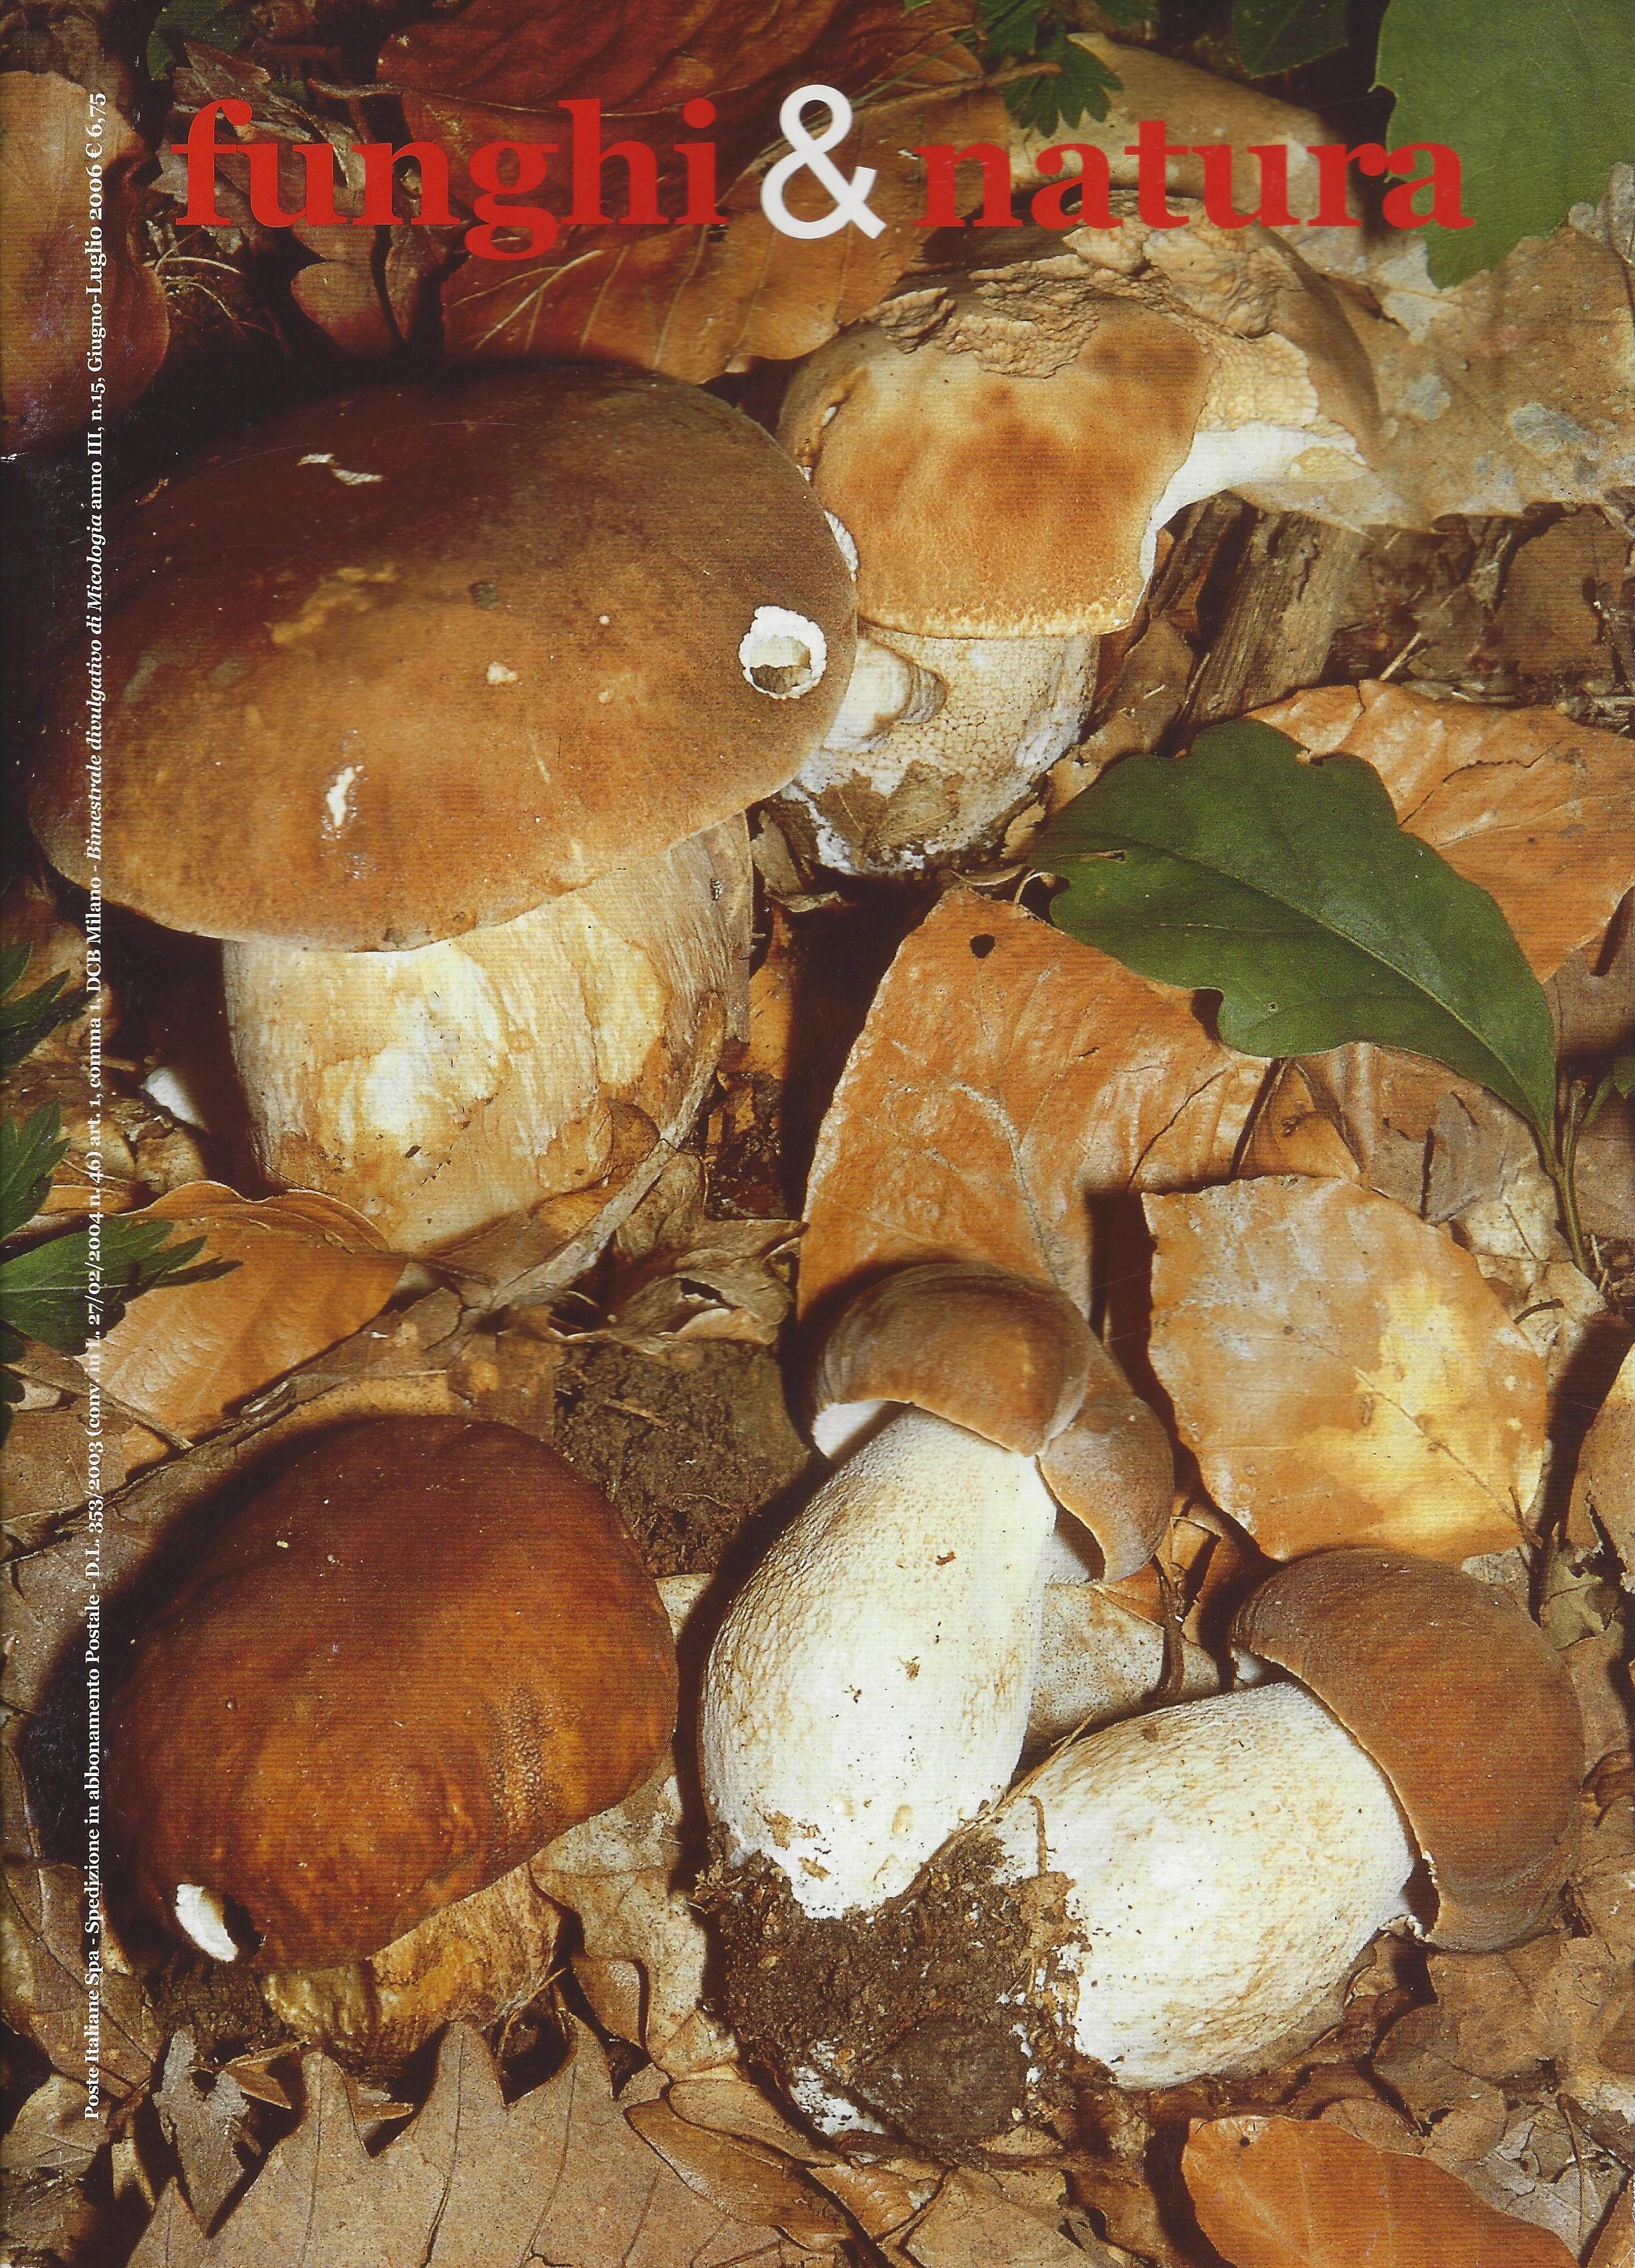 Funghi e natura 15